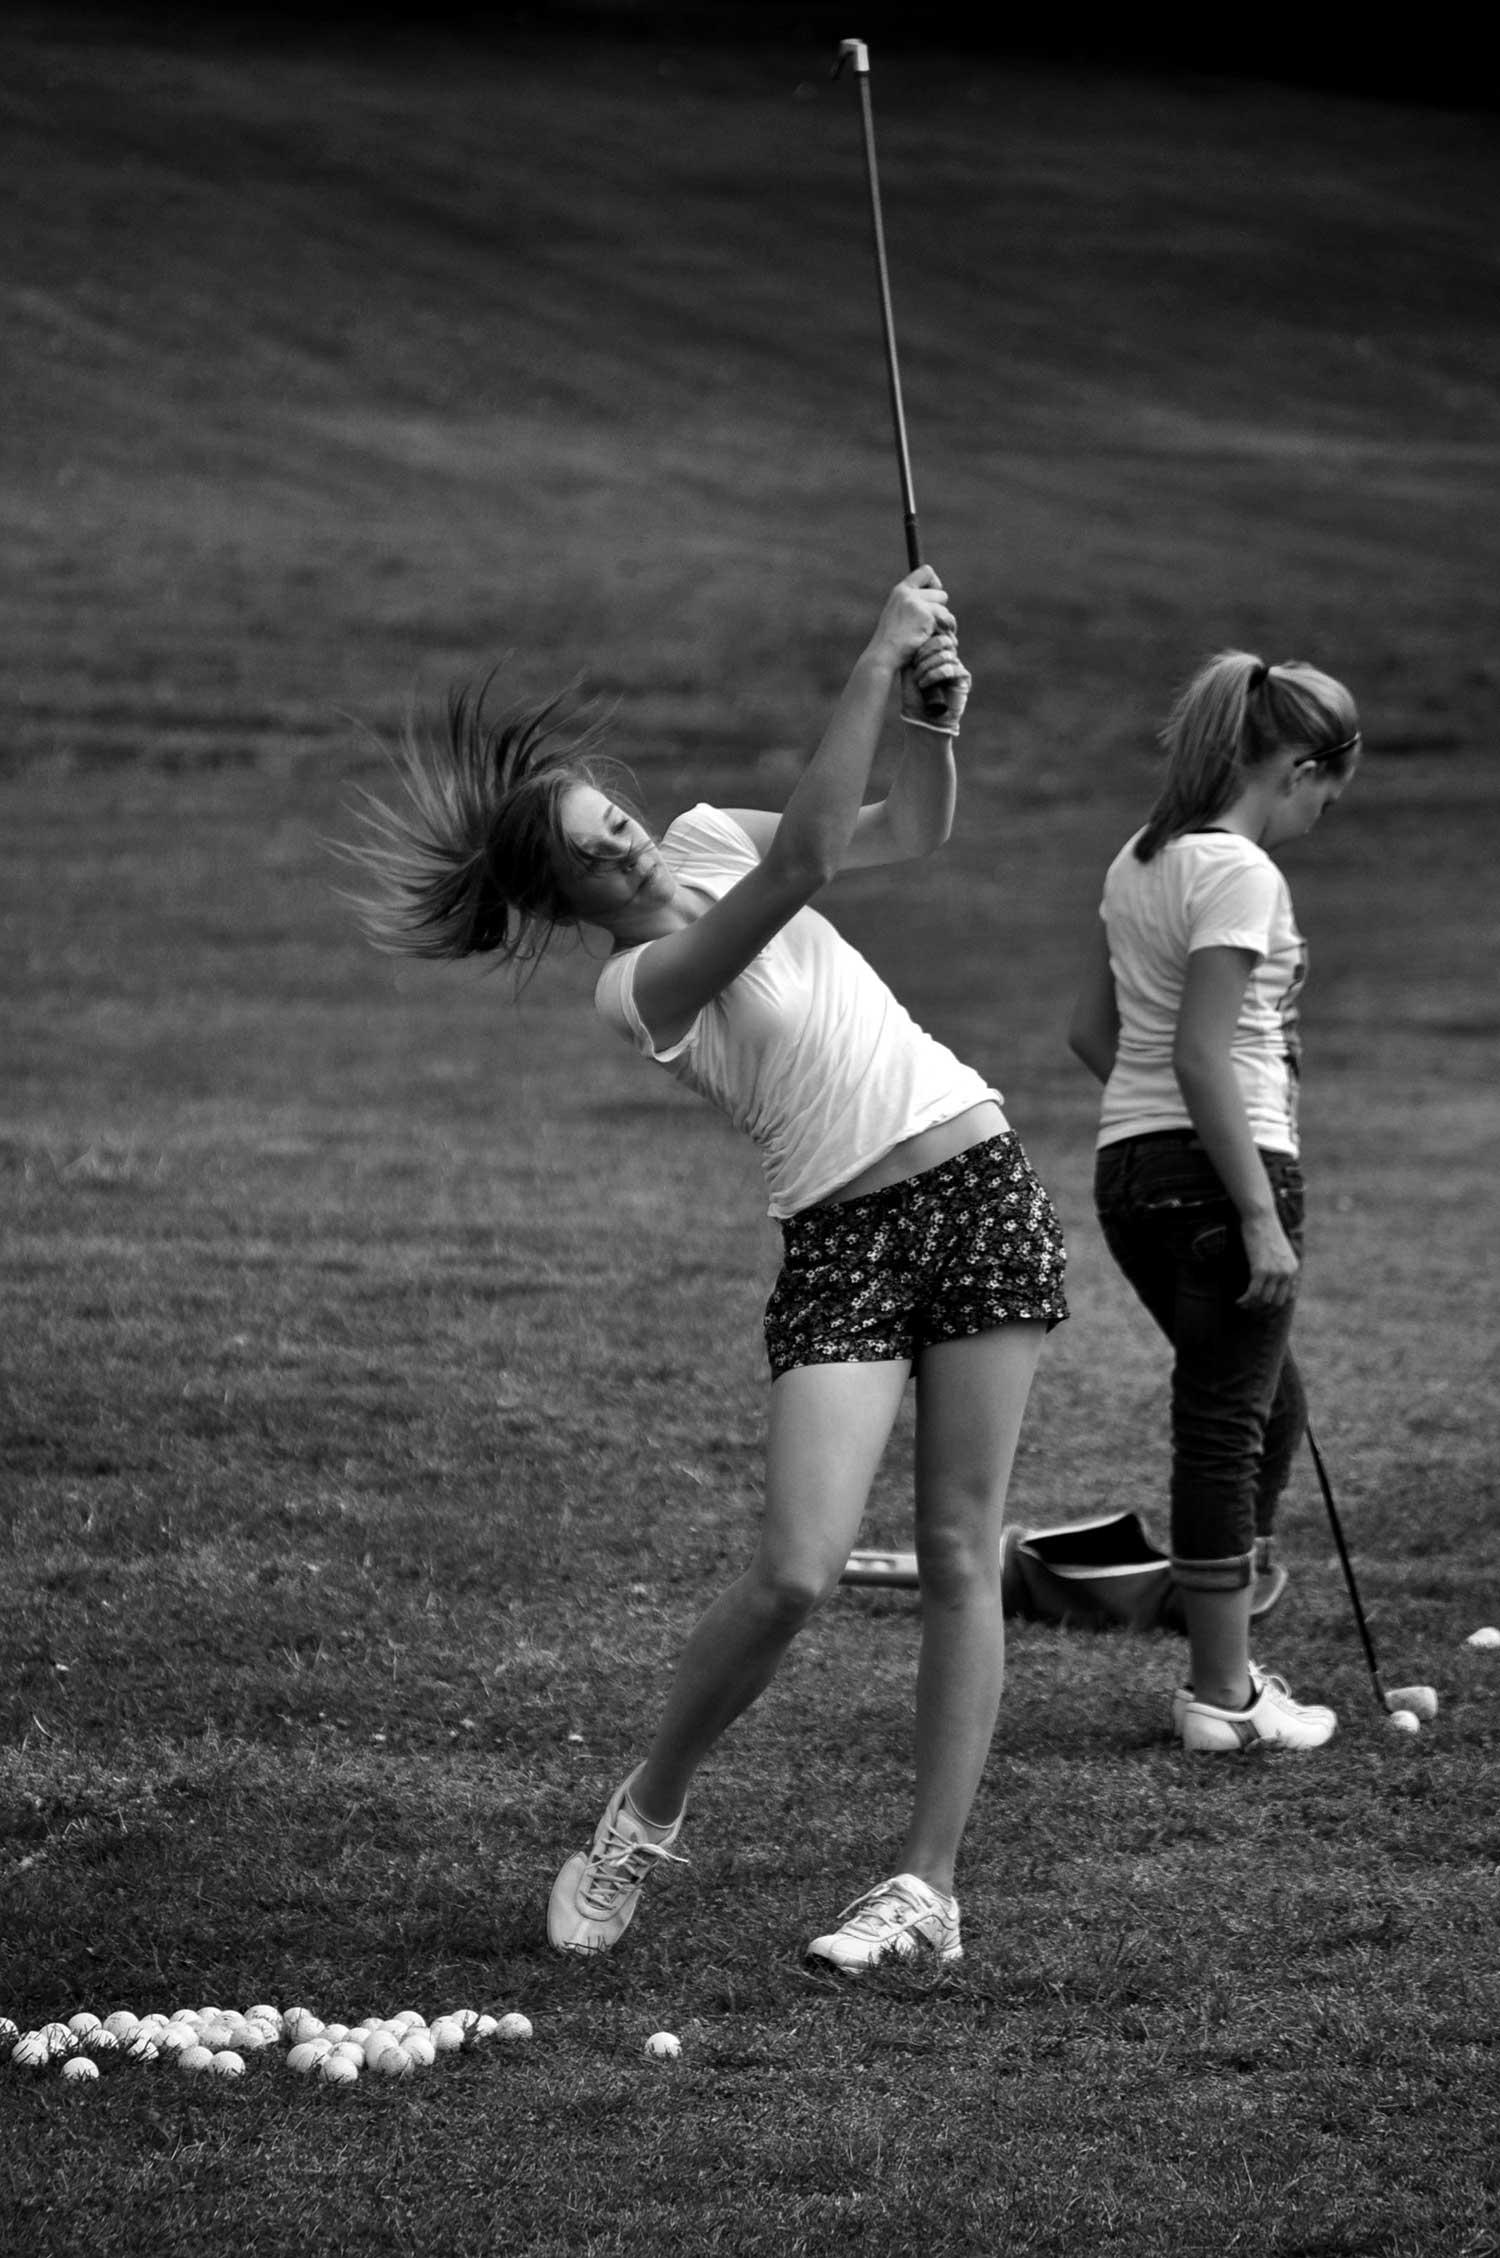 Marie Roach (left) Rachel Heatherly (right) practice their swings. photo by Jonathan Barrow - 2010